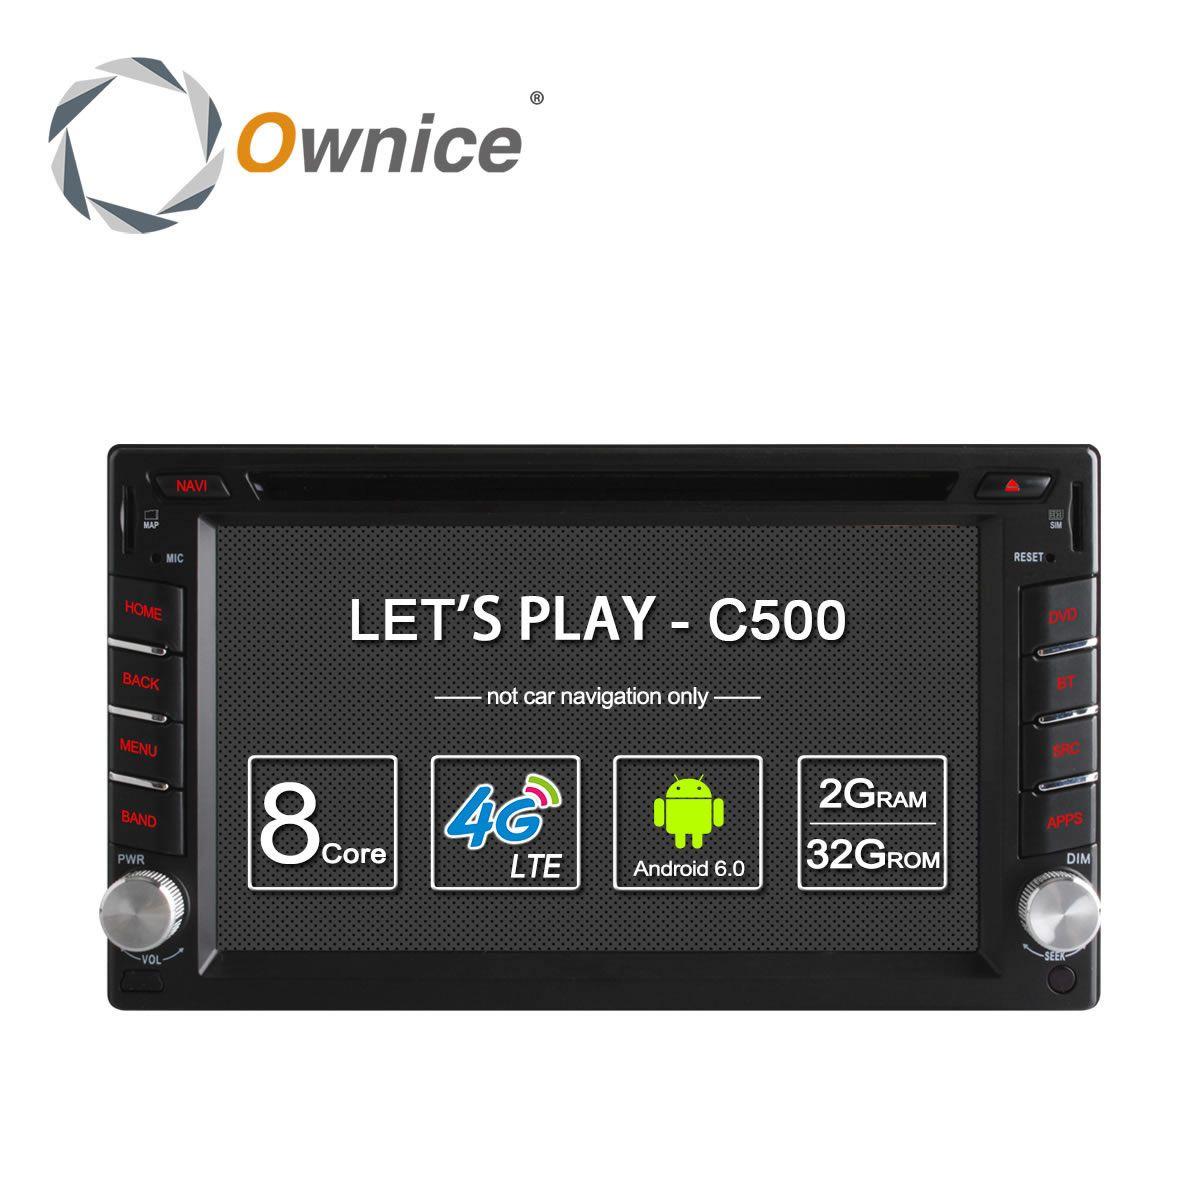 Ownice C500 Universal 2 din Android 6.0 Octa 8 Core Car DVD player GPS Wifi BT Radio BT 2GB RAM 32GB ROM 4G SIM LTE Network